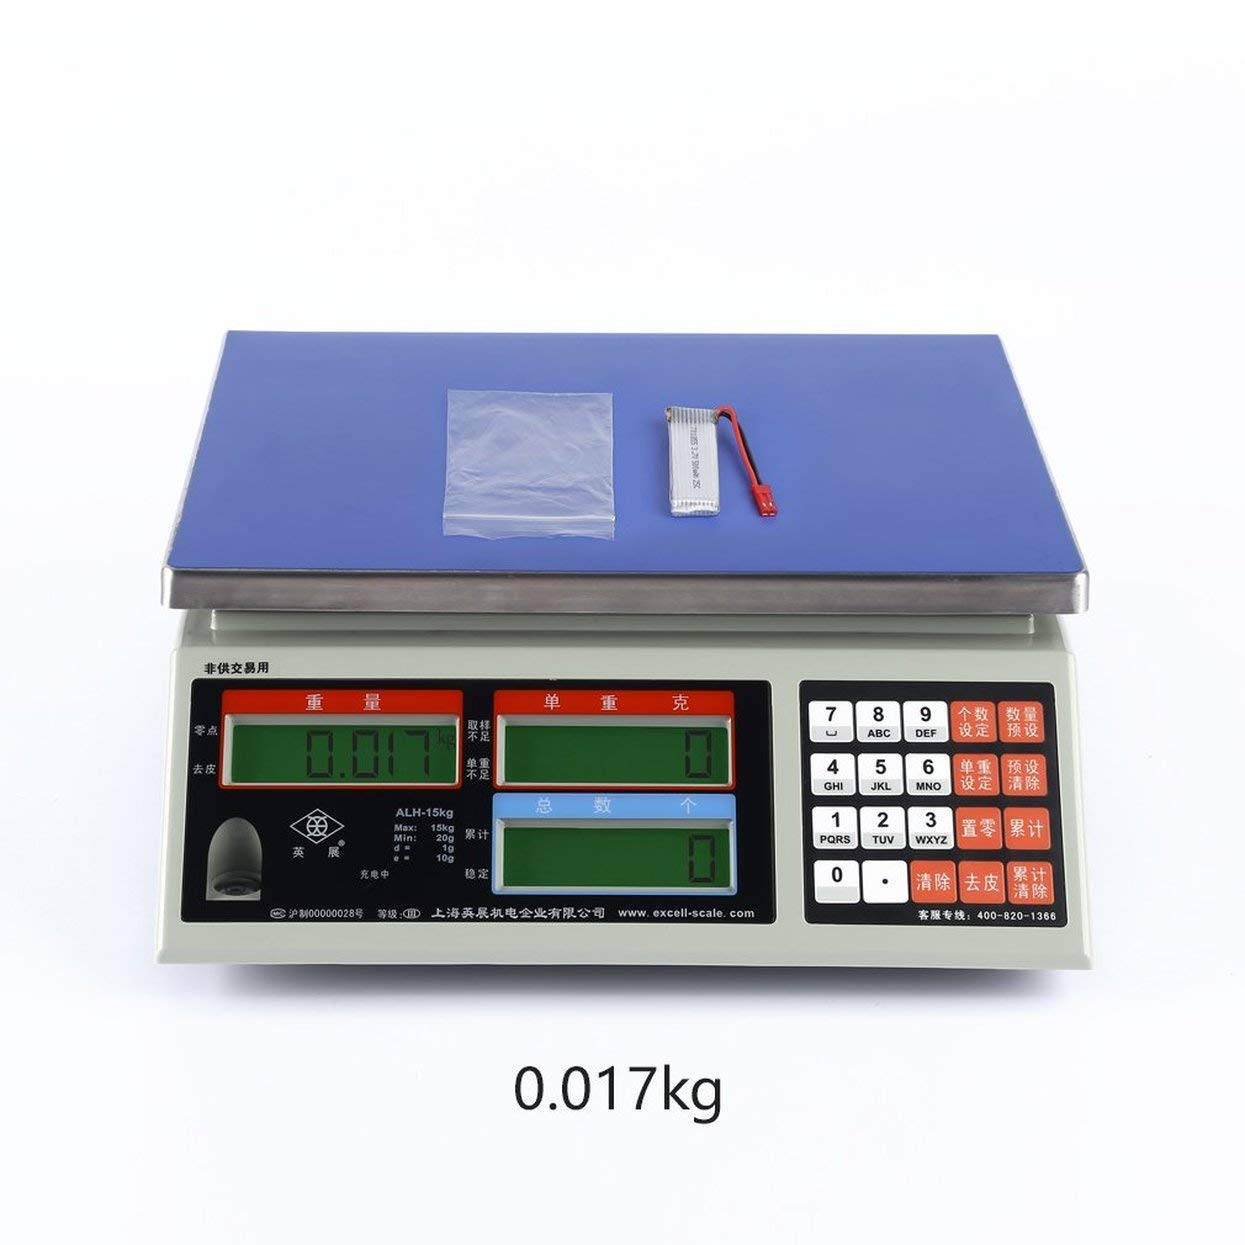 LoveOlvidoE 1 pc 3.7V 500mAh 25C Lipo bater/ía Modelo 701855 con JST Plug para FPV RC